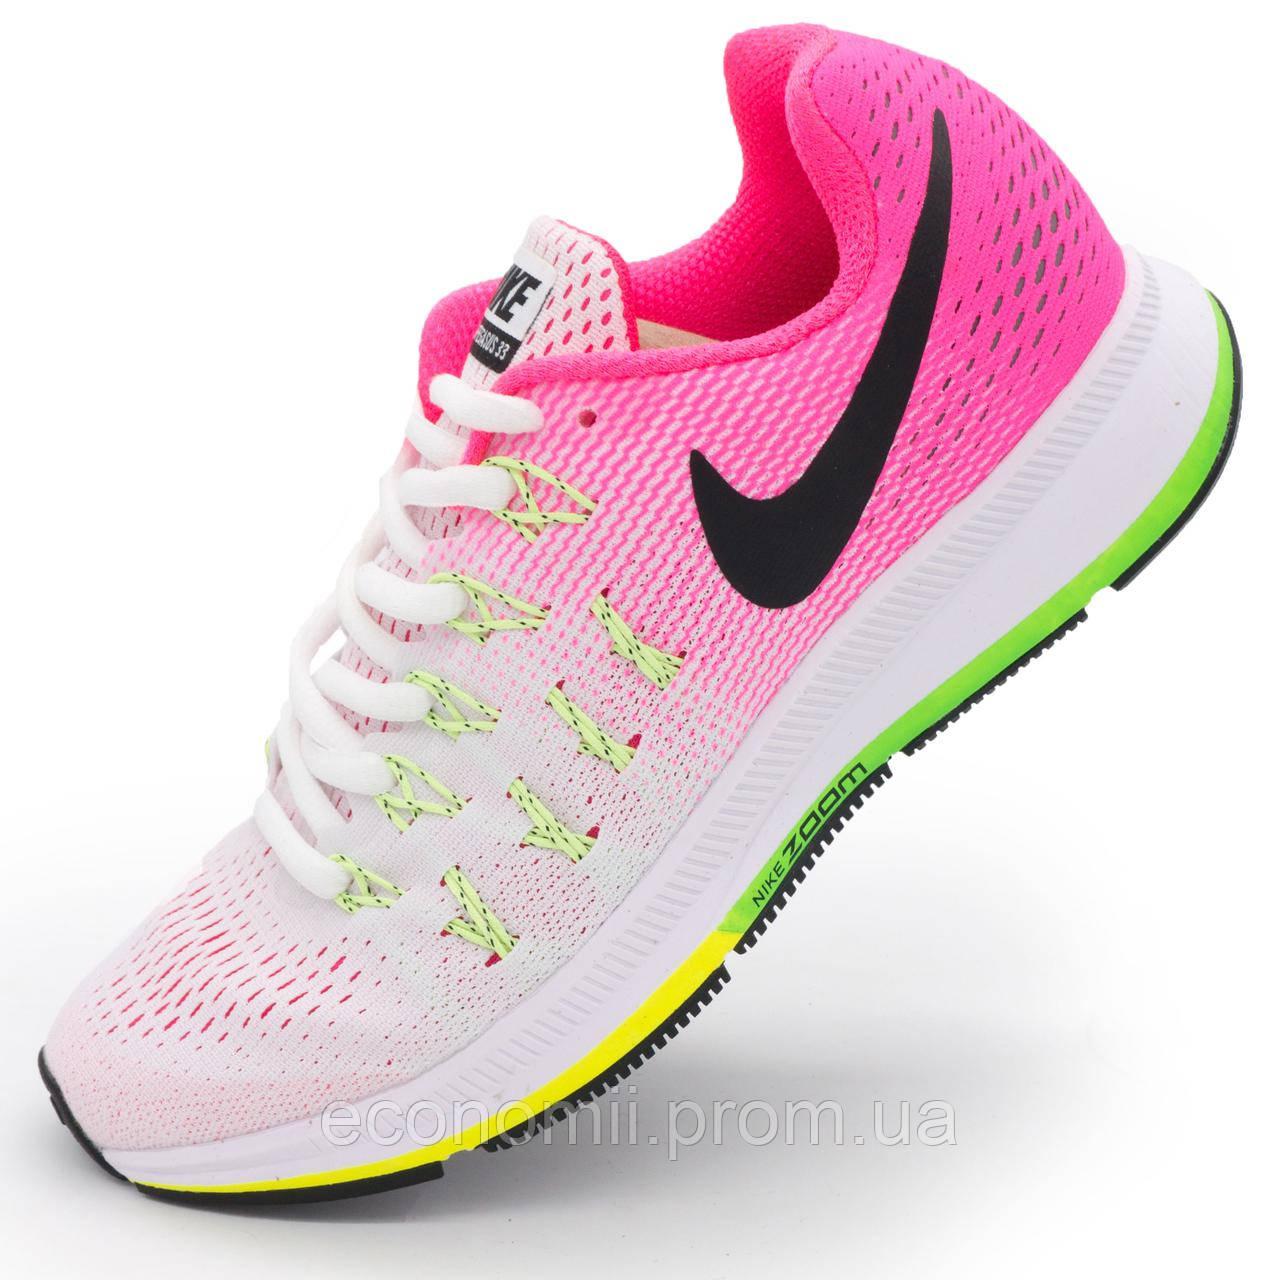 7db88767 Женские кроссовки для бега Nike Zoom Pegasus 33 белые. Топ качество! -  Реплика р.(38, 39, 40), цена 1 270 грн., купить в Днепре — Prom.ua  (ID#649059622)